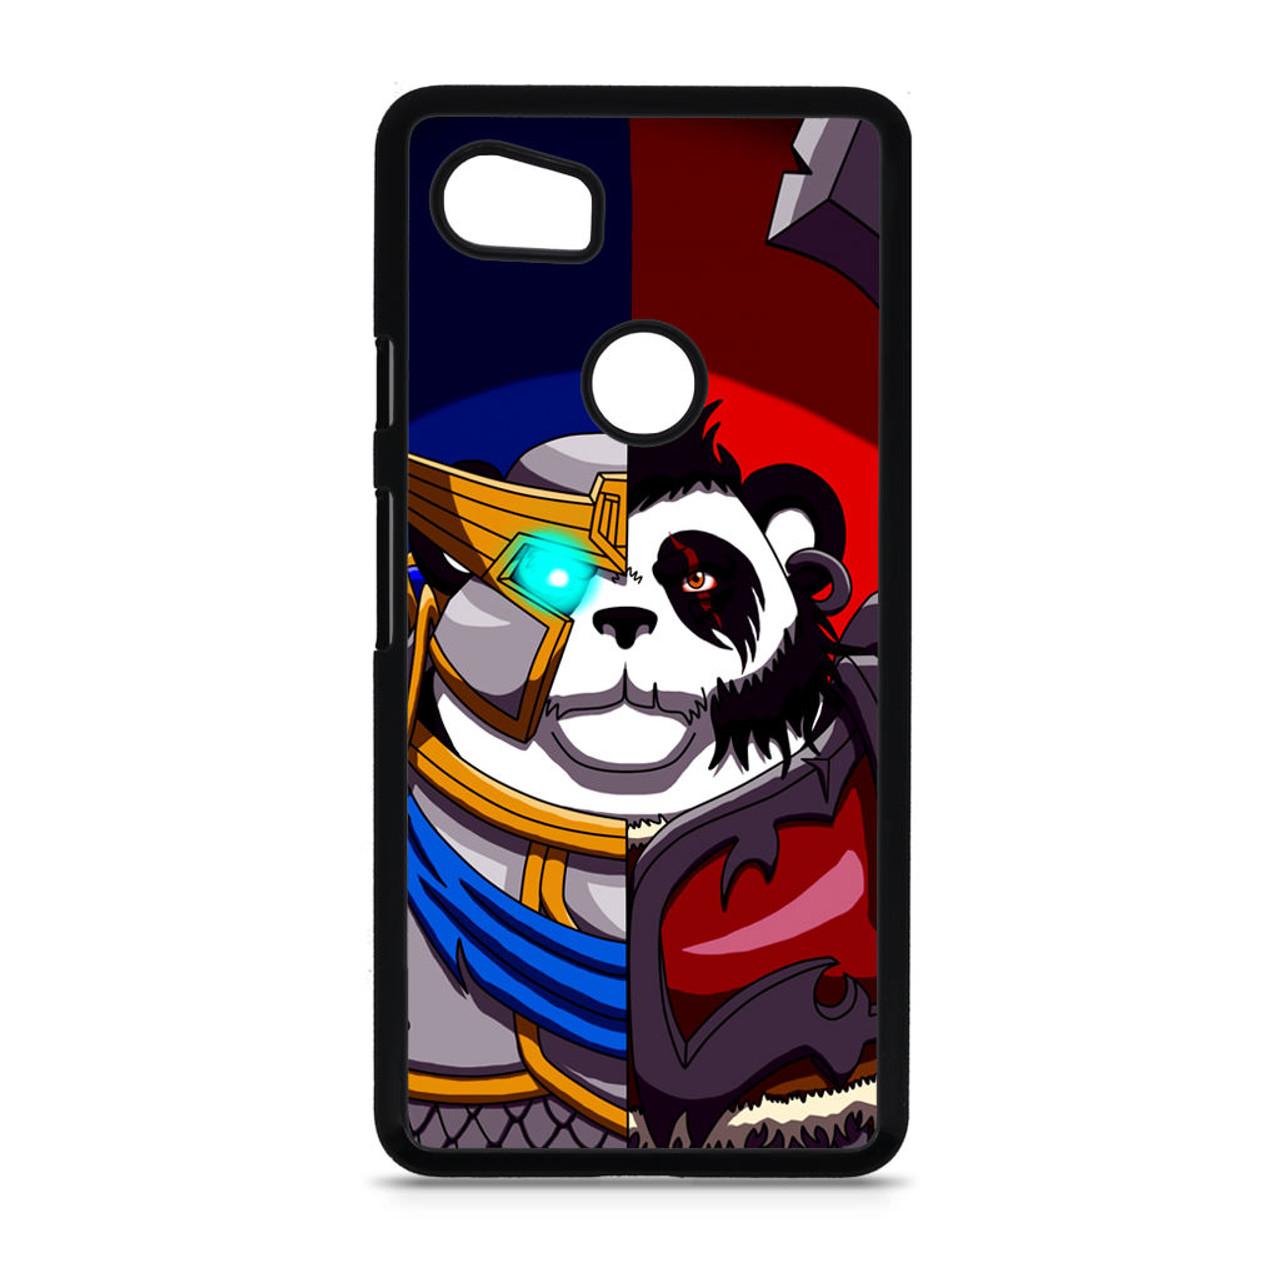 outlet store sale 287ba f5e74 World of Warcraft Alliance and Horde Panda Google Pixel 2 XL Case